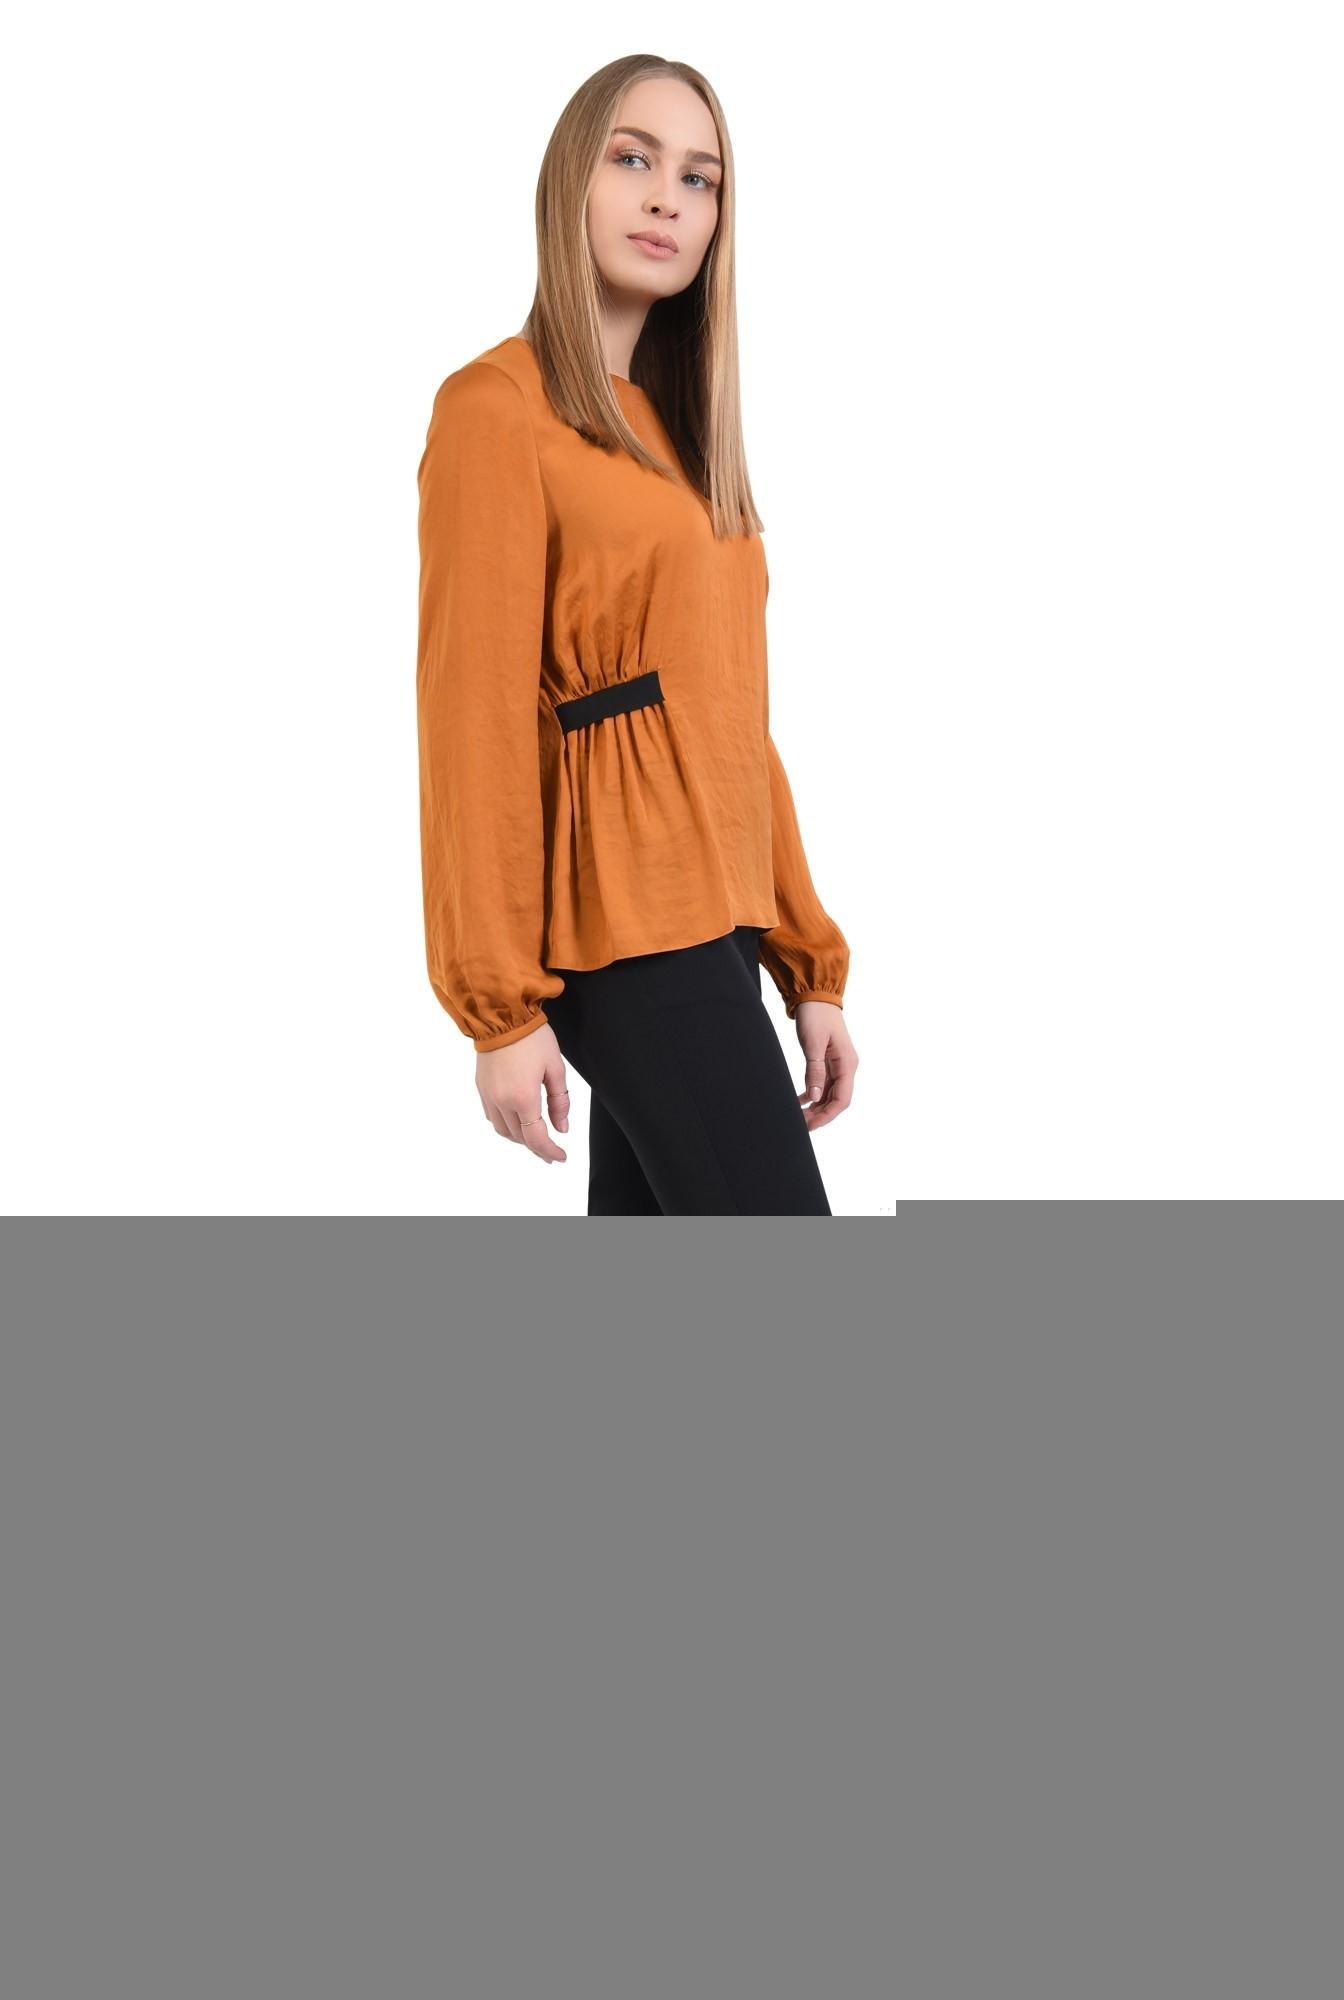 0 - bluza mustar, casual, satinata, rips decorativ, maneci lungi